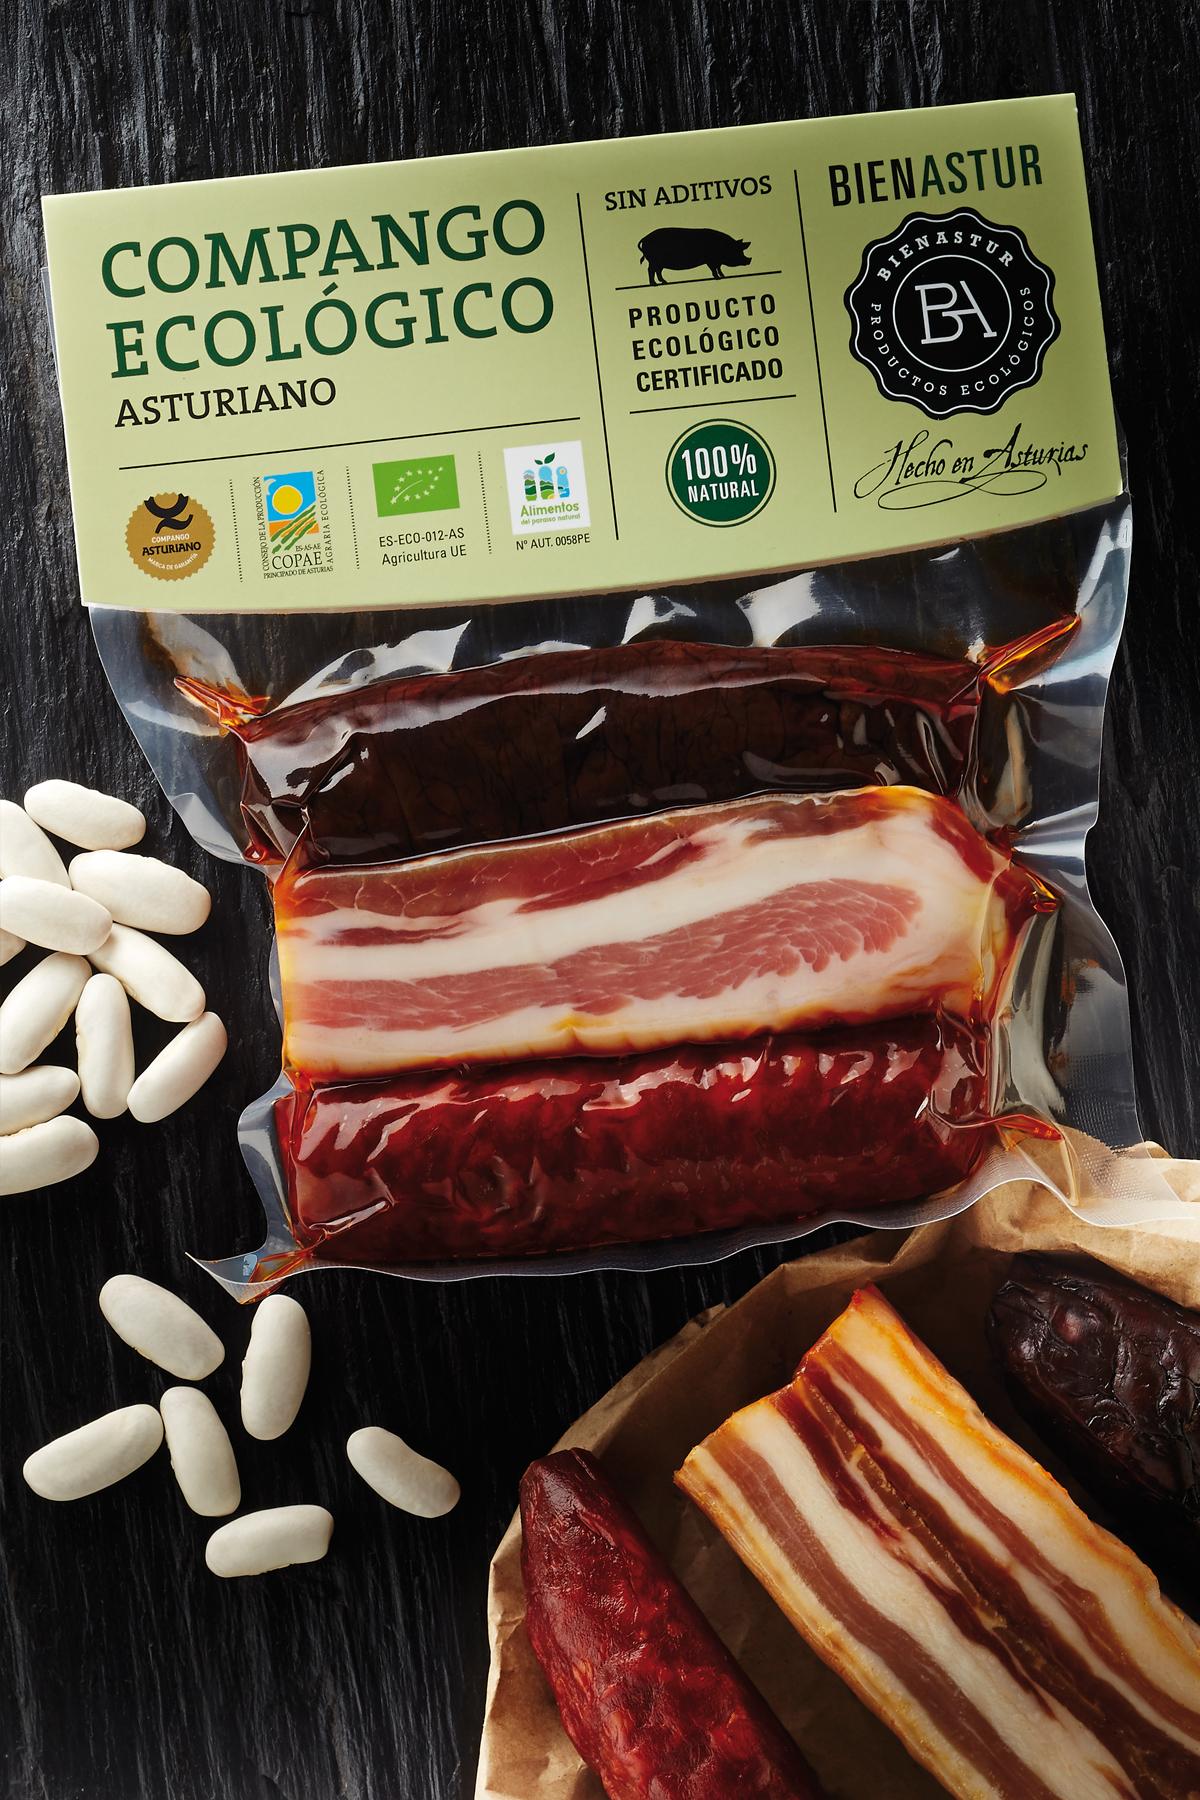 Smoked Asturian Ecological Compango 300 g